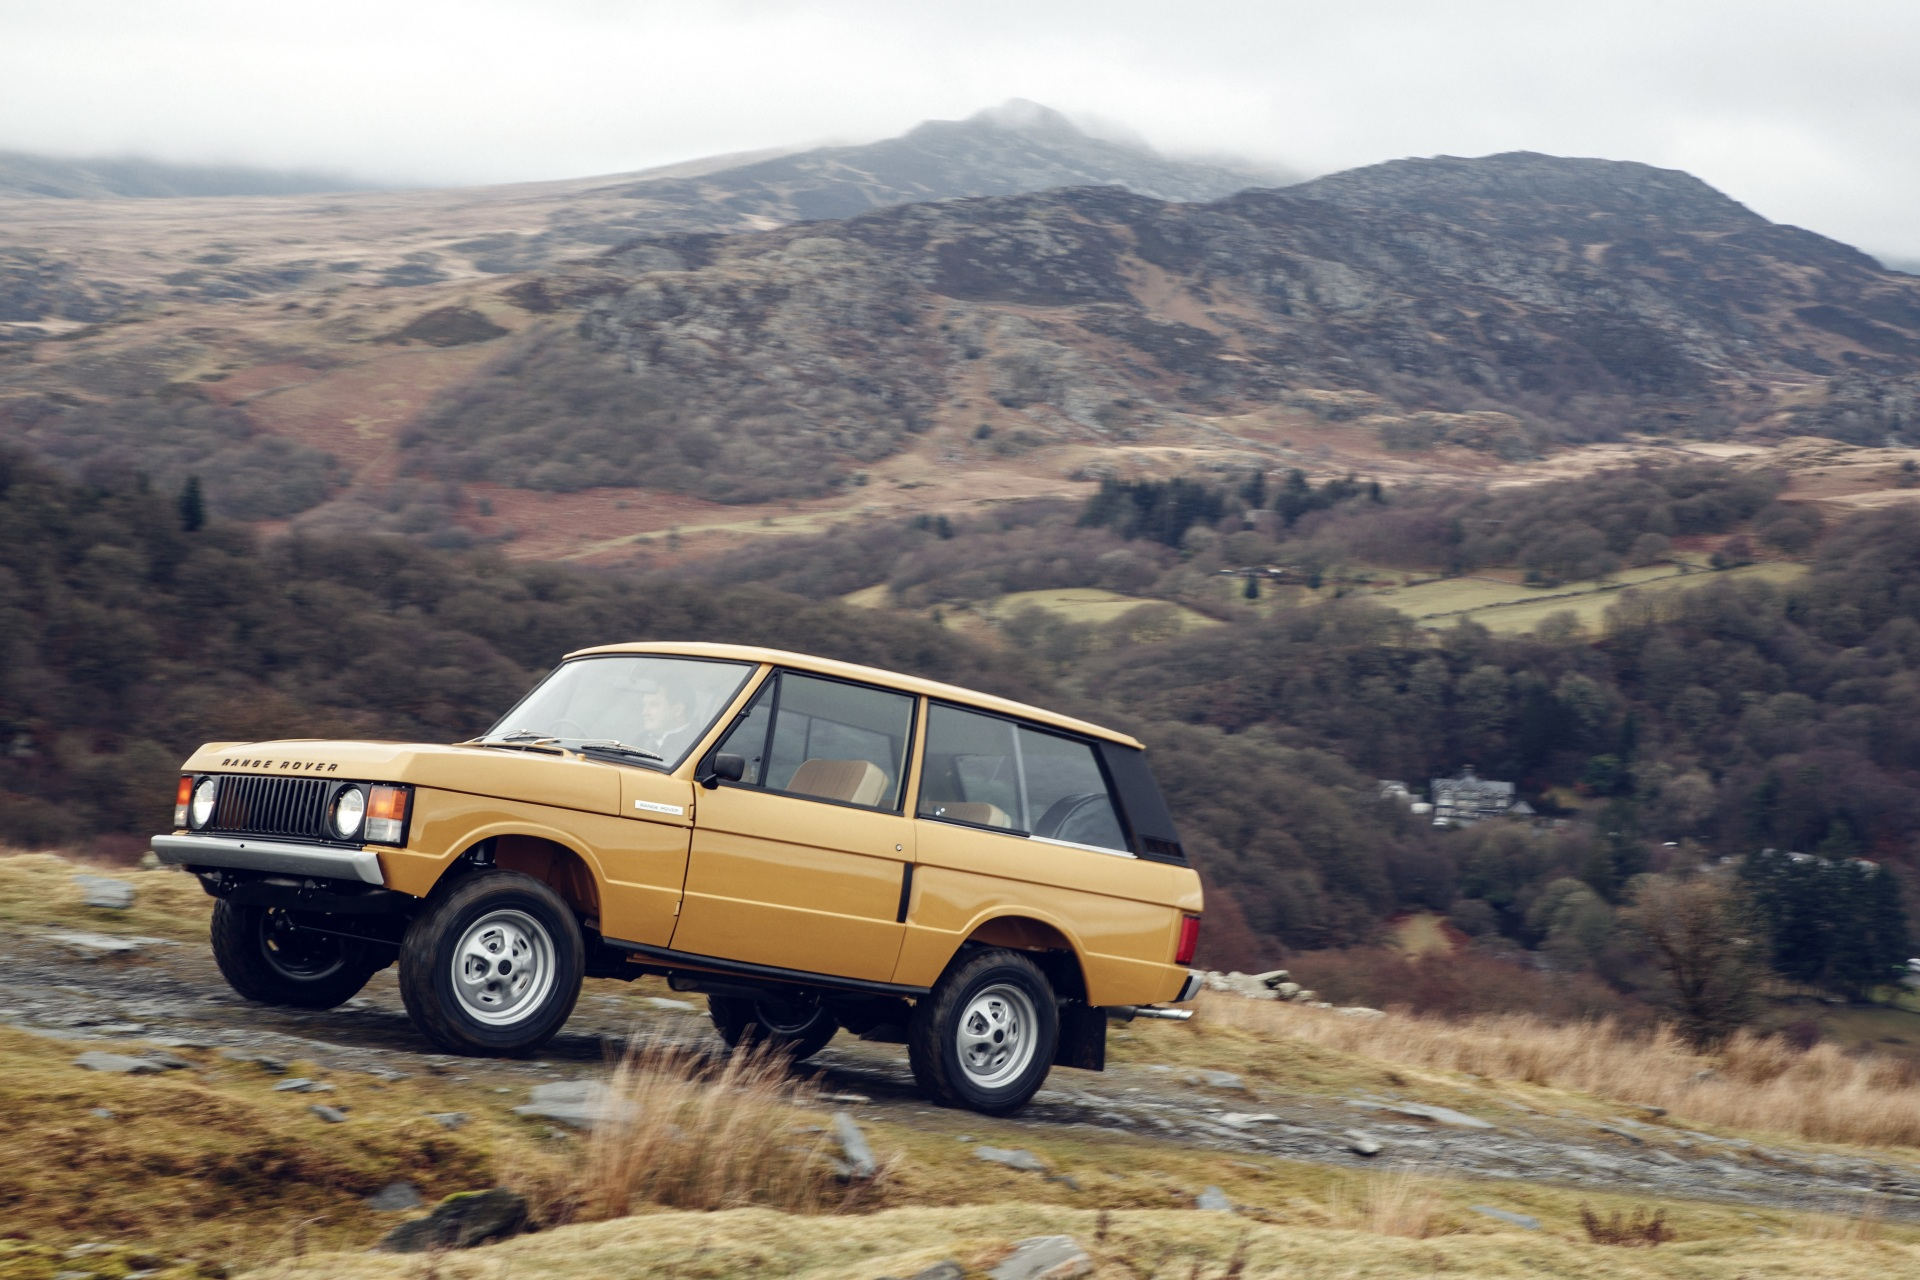 The restored 1979 Range Rover Three Door  (Range Rover Photo)